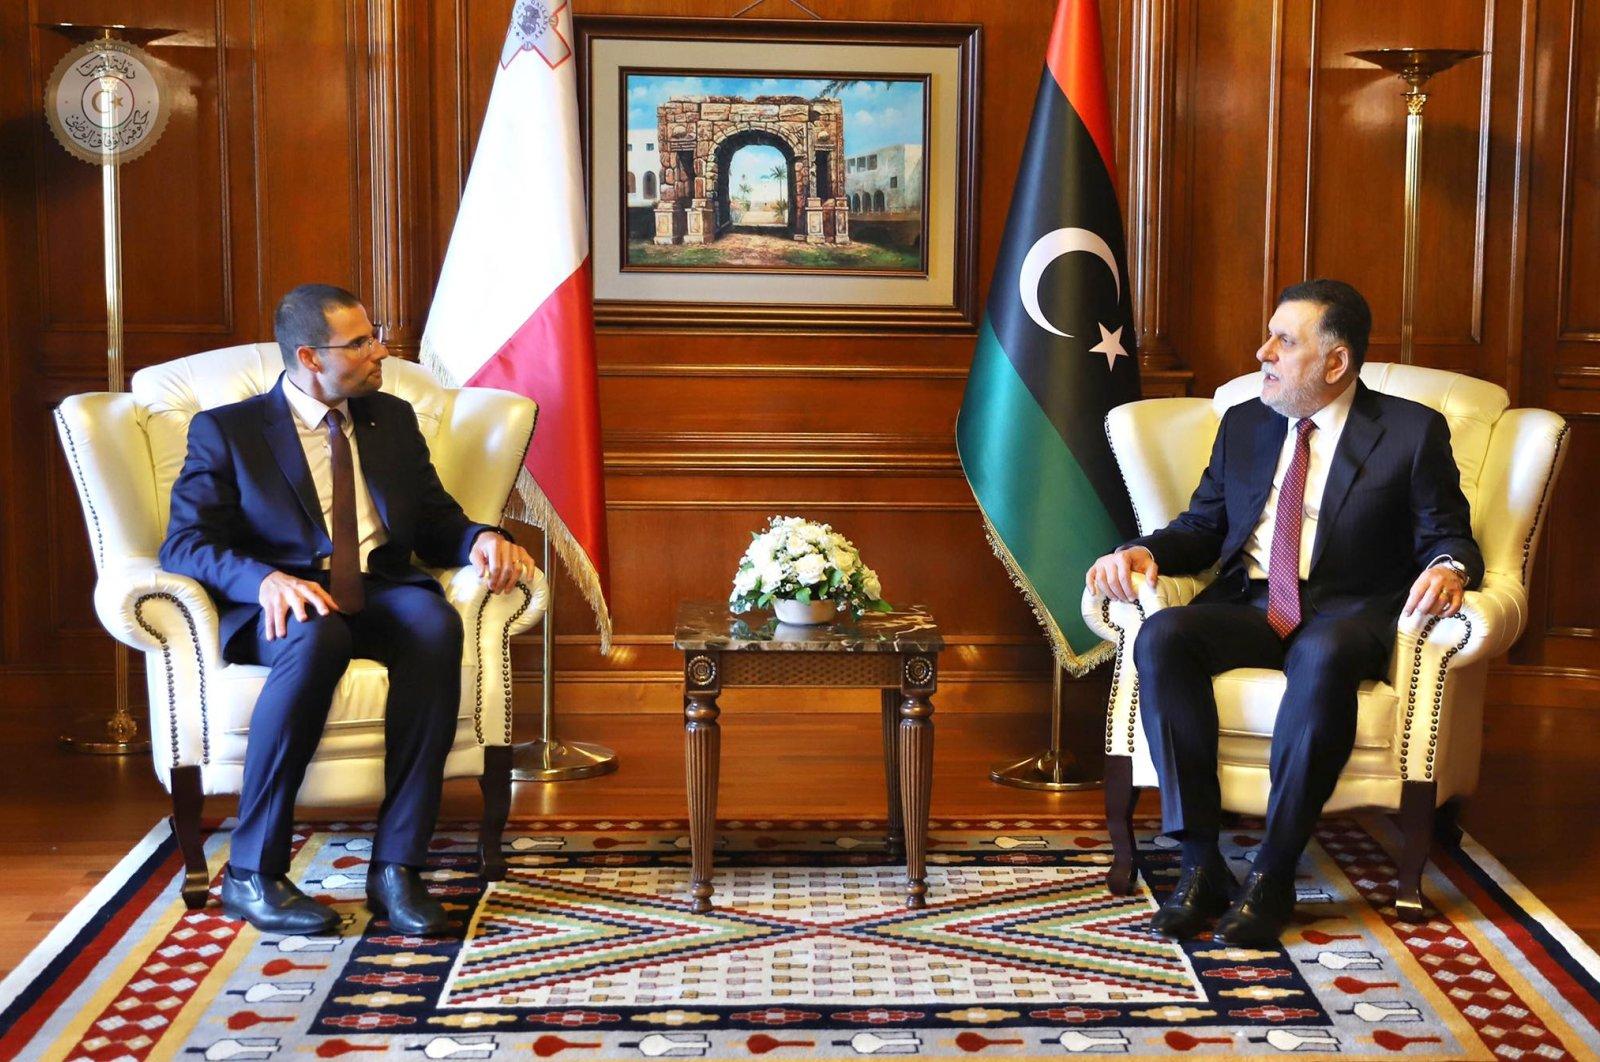 Malta's Prime Minister Robert Abela (L) speaks with Libyan counterpart Fayez Sarraj during a bilateral meeting in Valetta, Malta, May 28, 2020. (AA Photo)